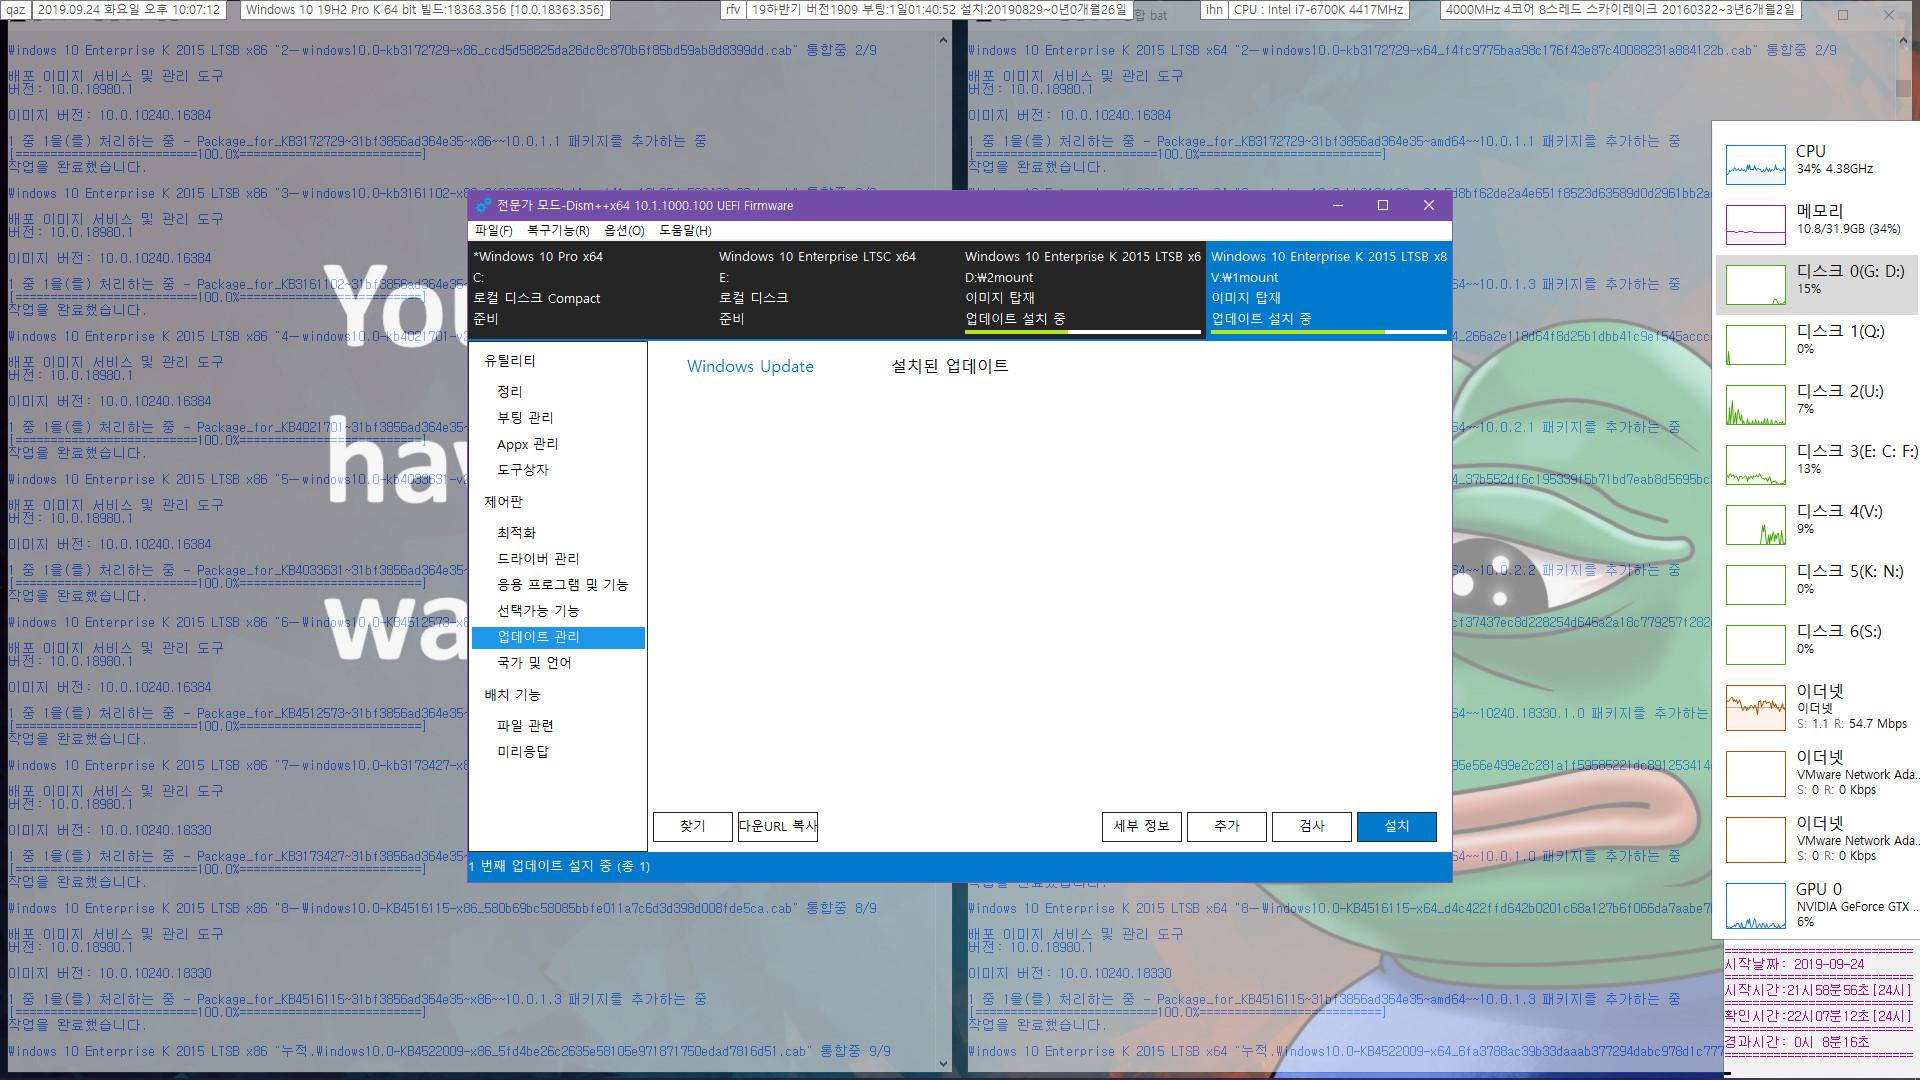 Windows 10 버전 1507 누적 업데이트 KB4522009 (OS 빌드 10240.18334) [2019-09-23 일자] 나왔네요 - 2015 LTSB 통합중 입니다 2019-09-24_220712.jpg